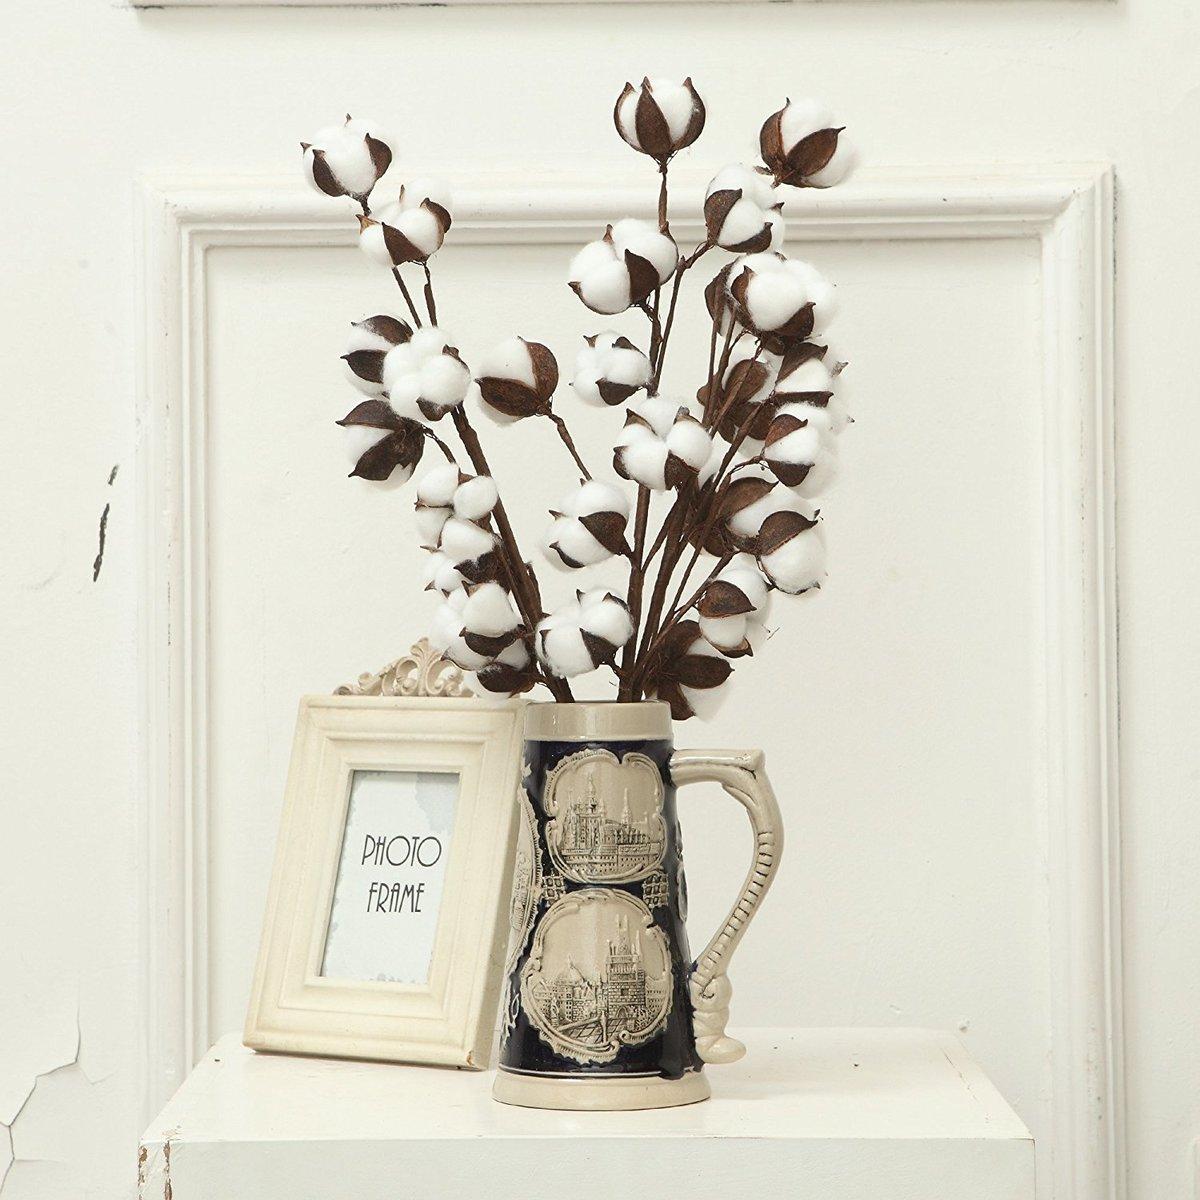 artificial cotton flower single branch 10 petals 52cm simulation flower DIY wedding decoration for home party office C18112601